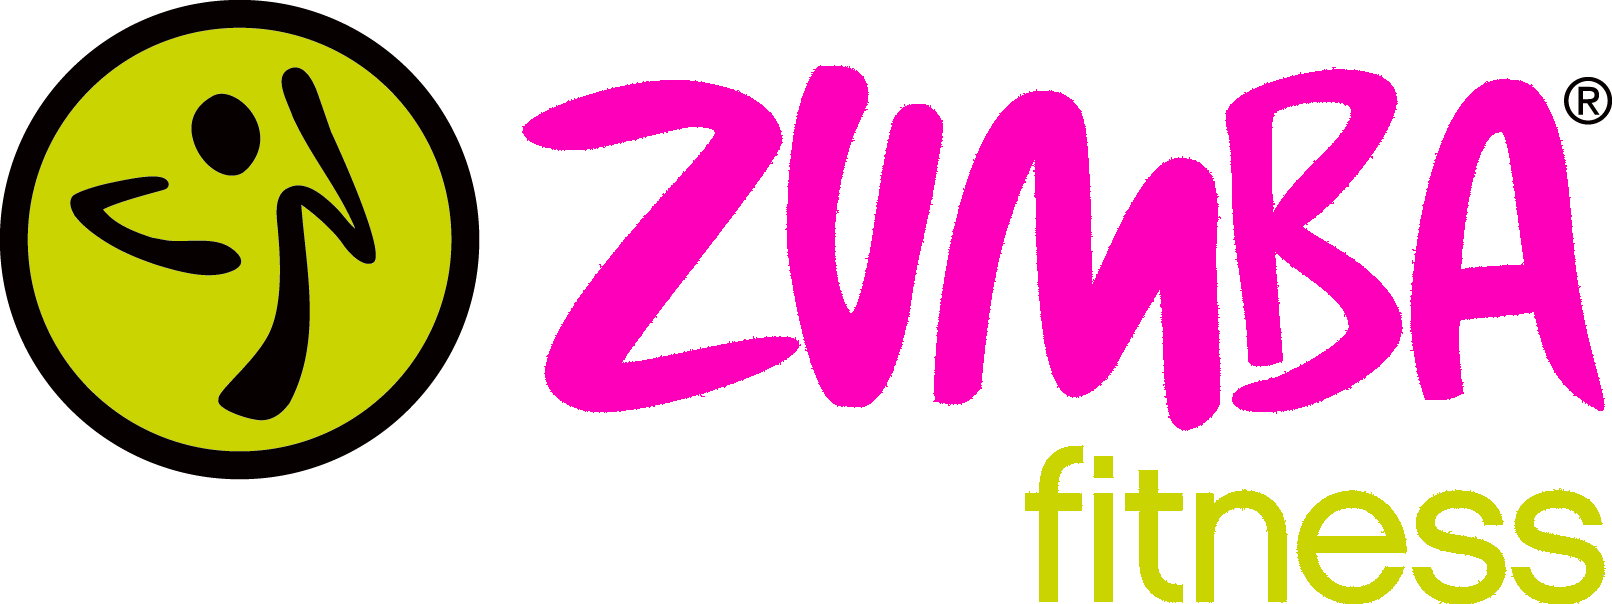 Carla P Roquecruz Love Love Love Her Zumba Class And Her Generous Spirit Zumba Workout Zumba Logo Fitness Site